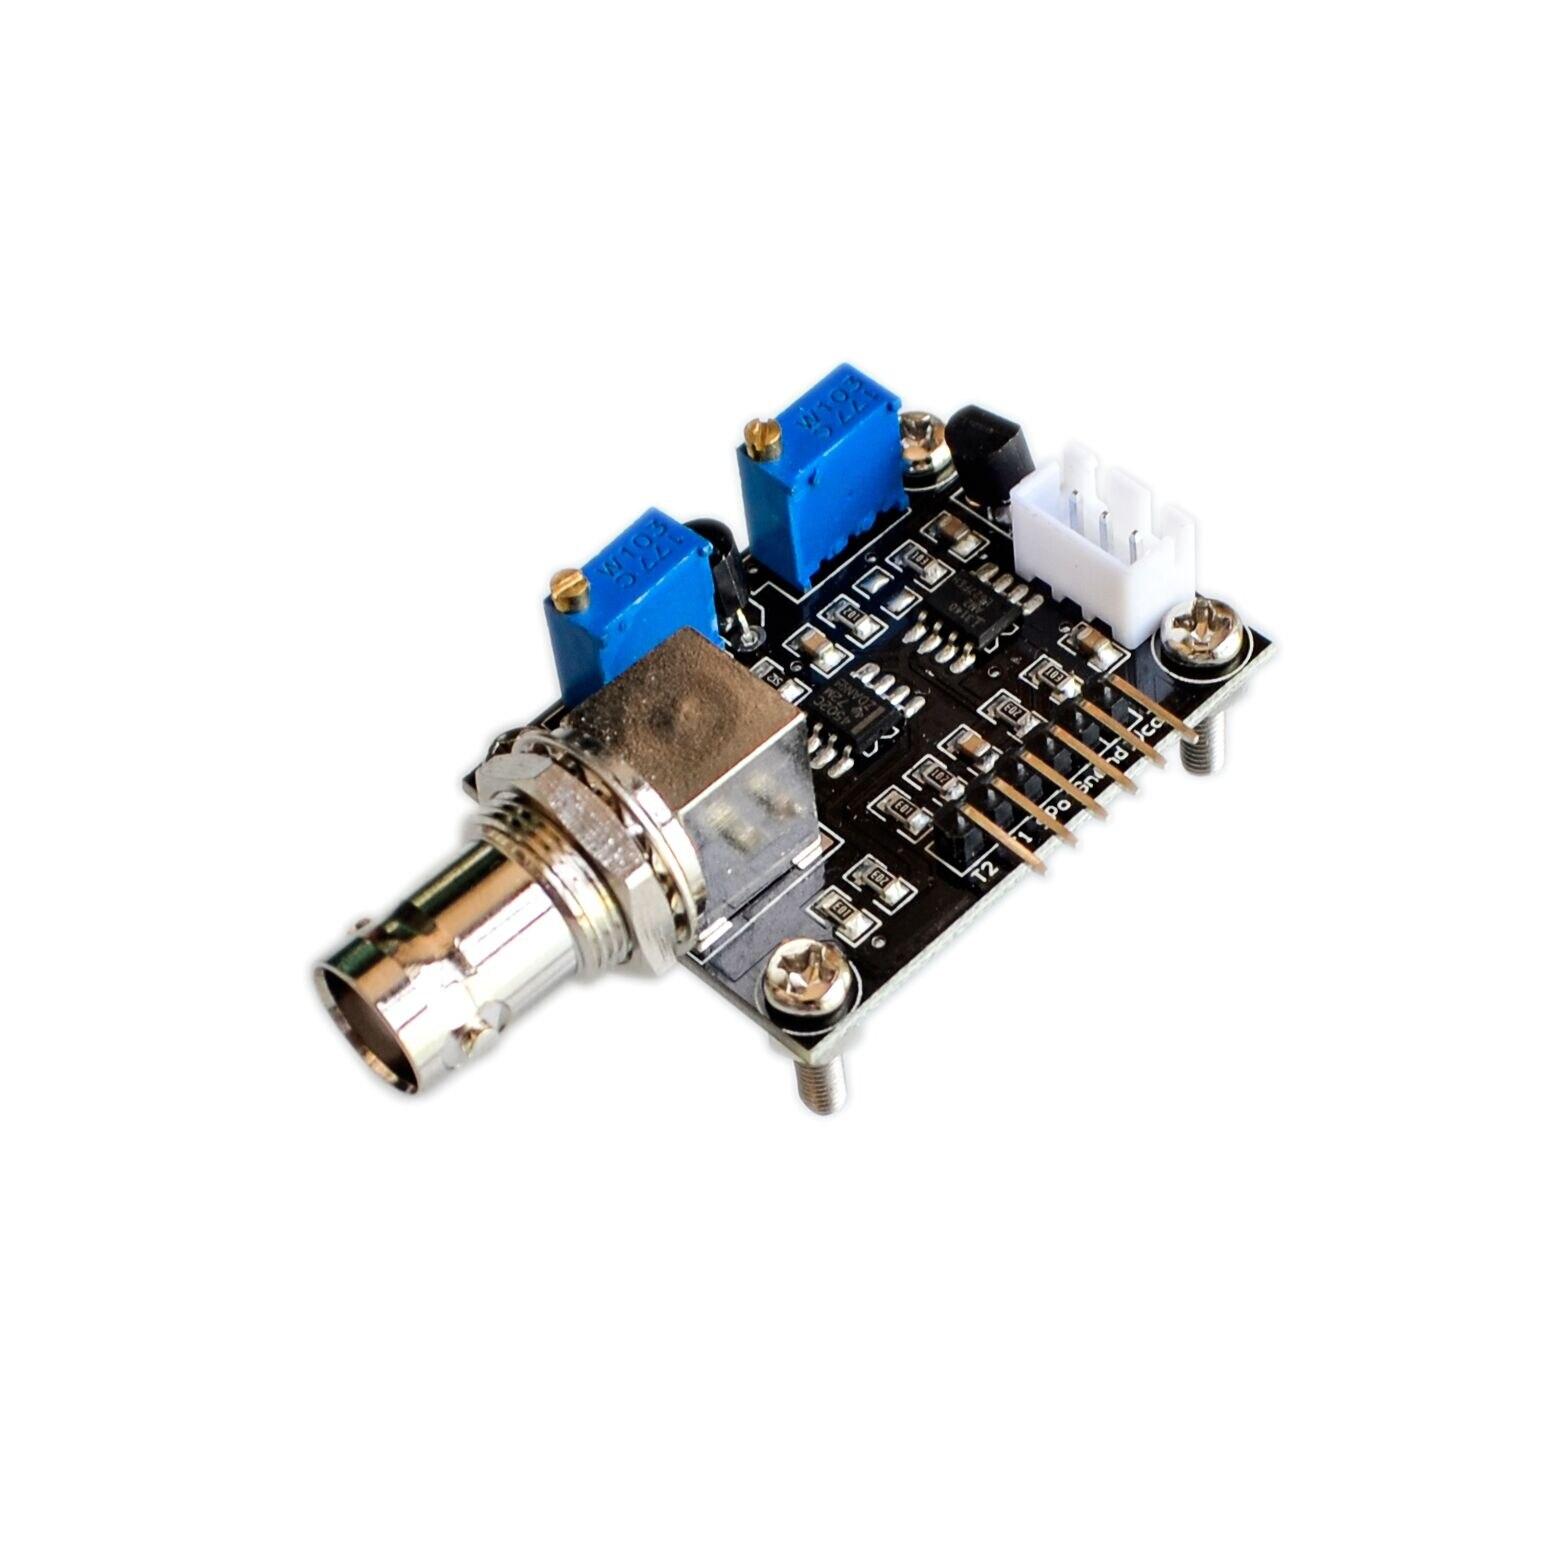 el-valor-de-ph-de-deteccion-de-detectar-regulador-modulo-de-sensor-de-control-de-monitoreo-tester-medidor-de-ph-0-14-para-arduino